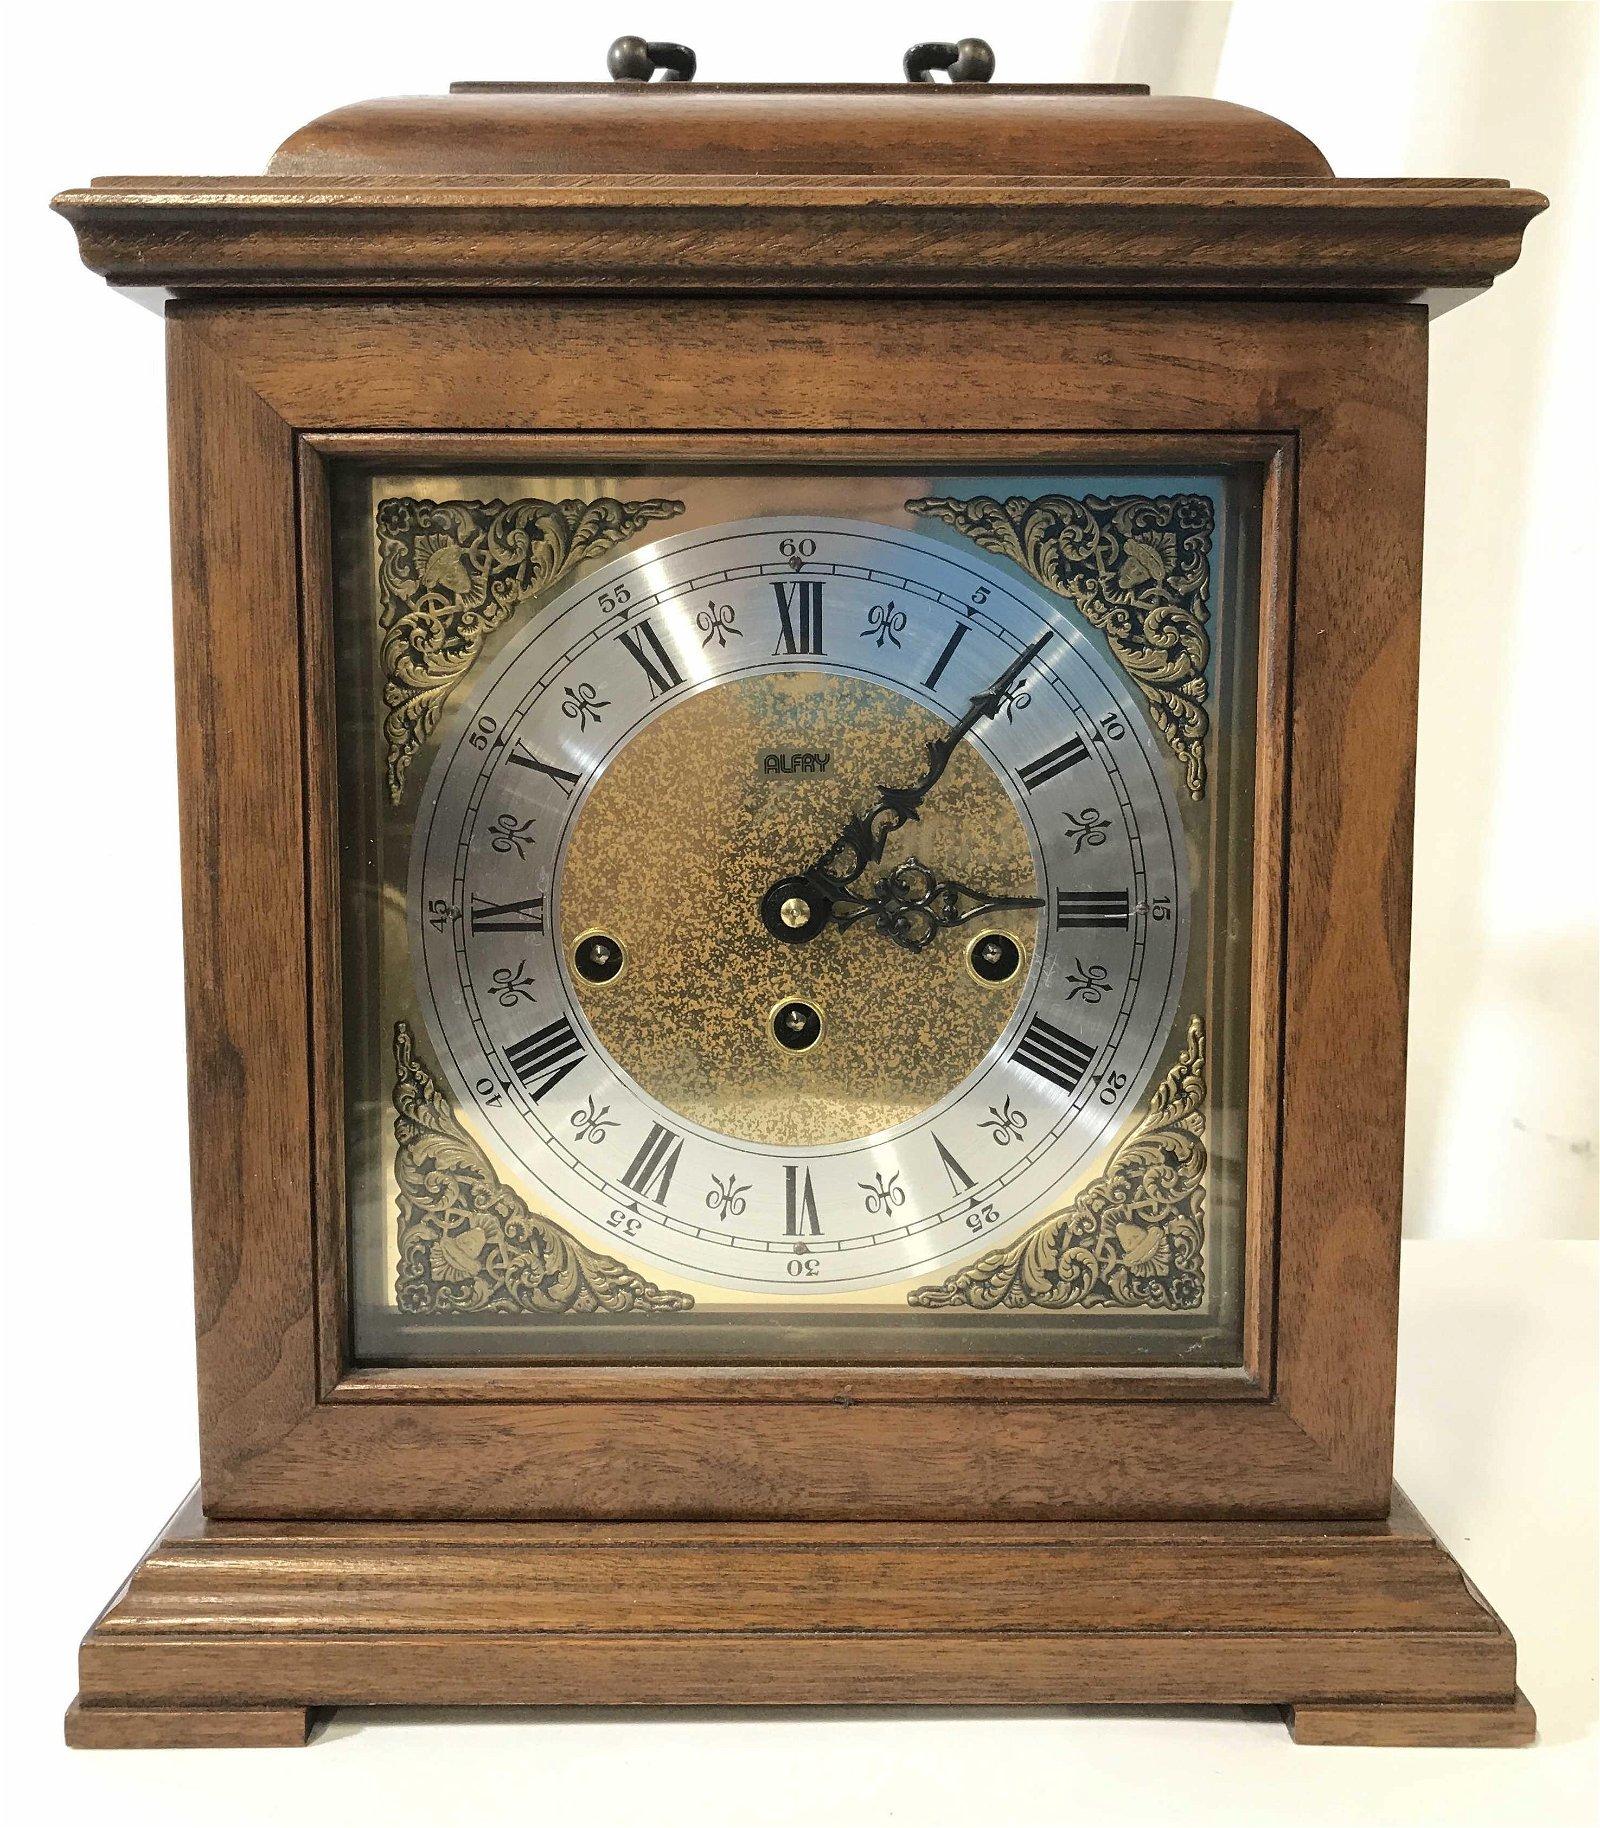 Vintage ALFRY Carved Wooden Mantel Clock